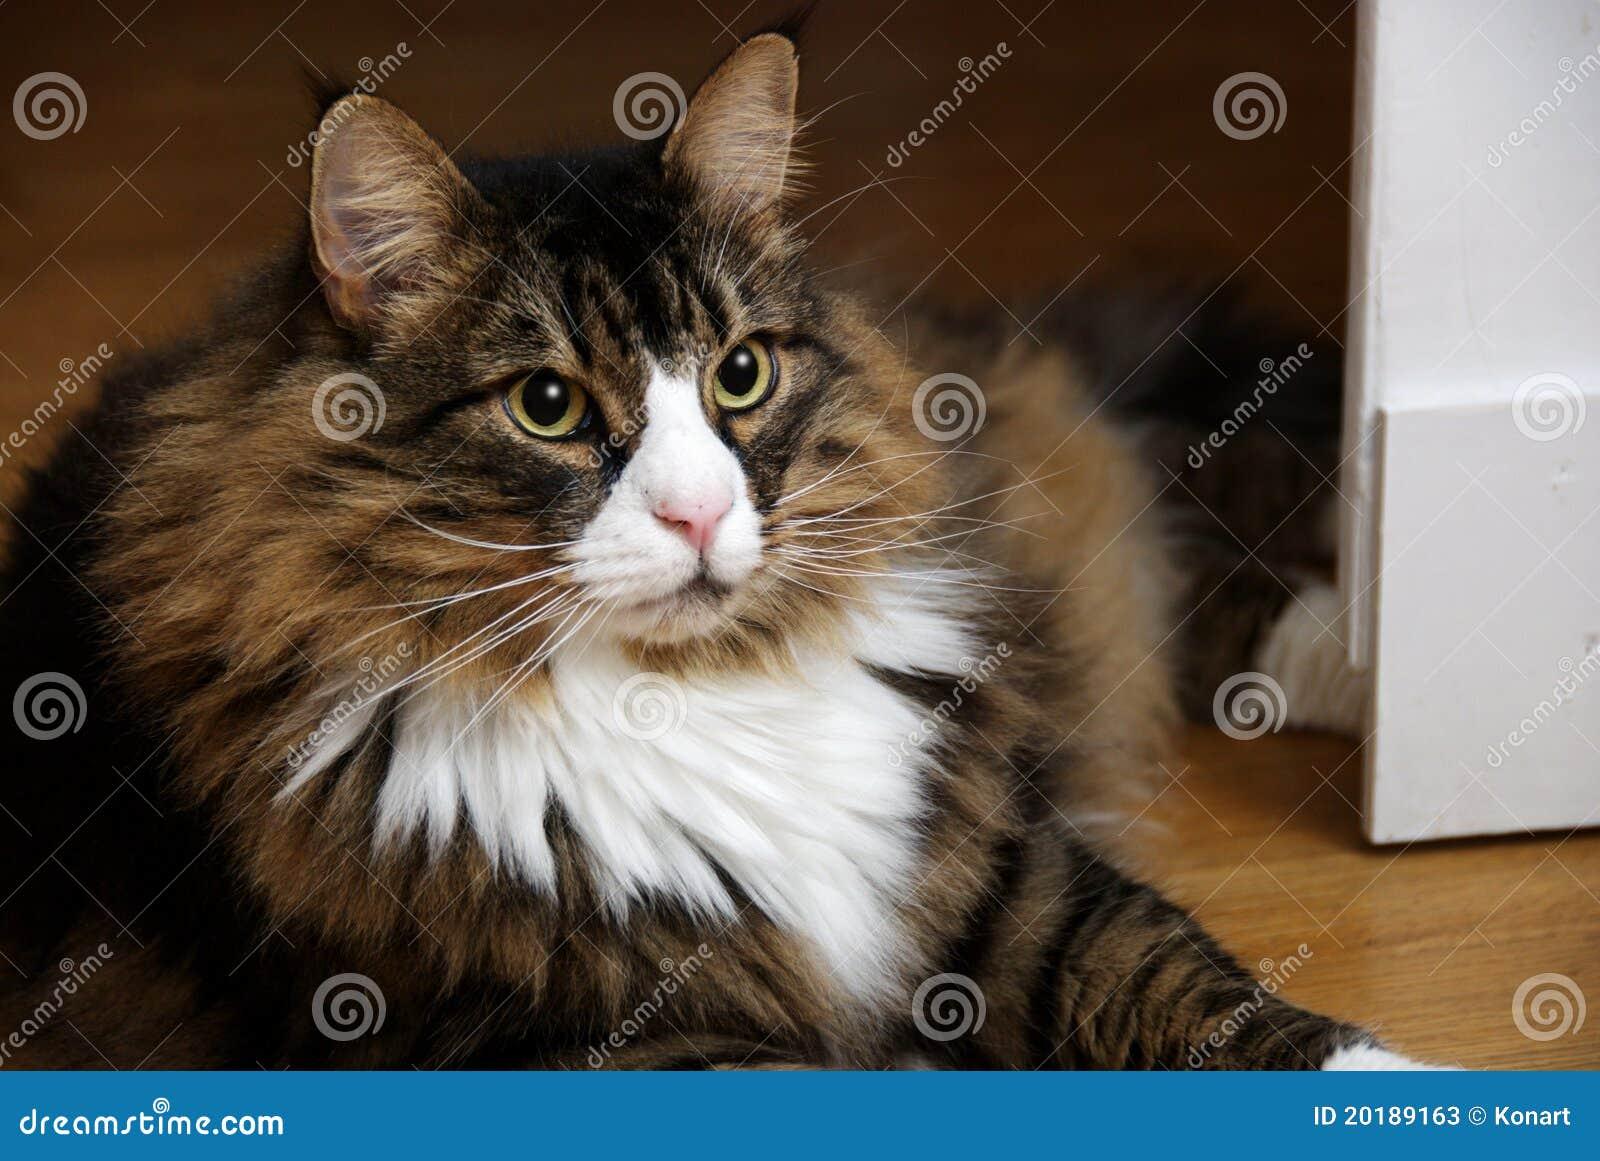 Do Big Cats Loaf